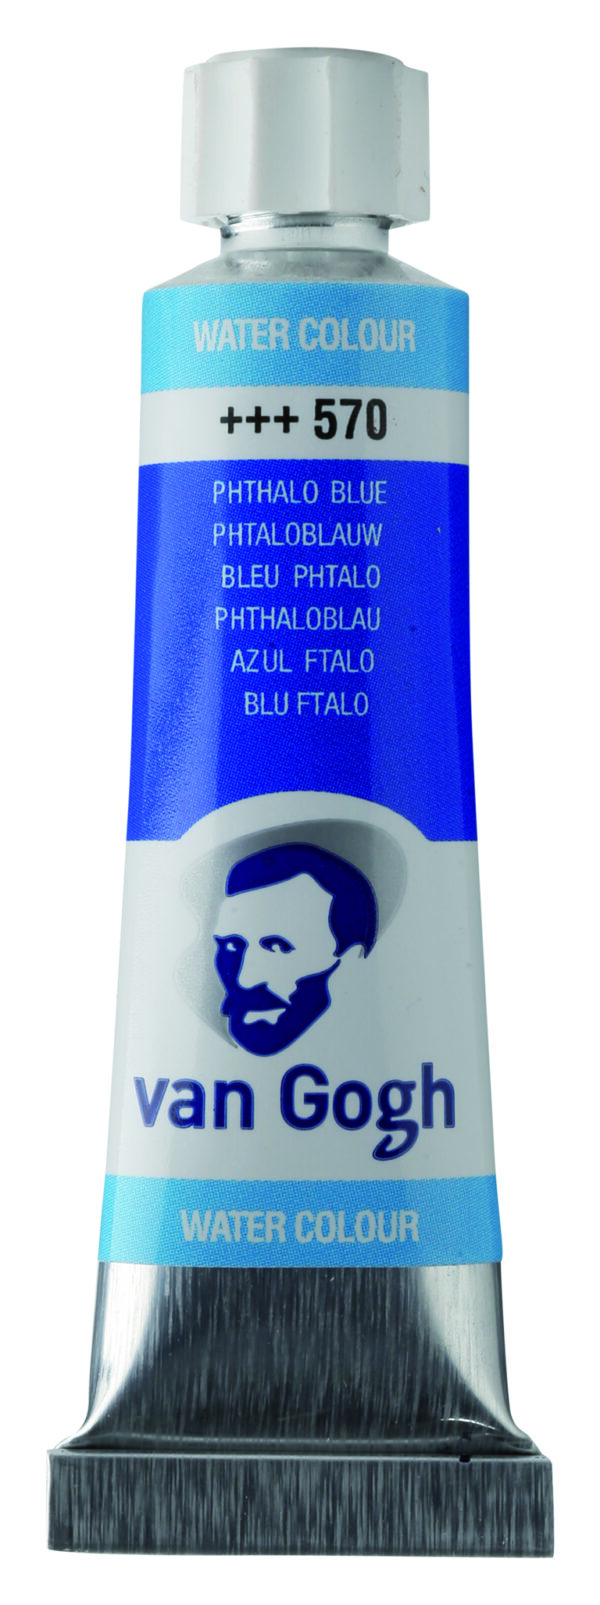 Van Gogh 570 Phthalo blue - 10 ml